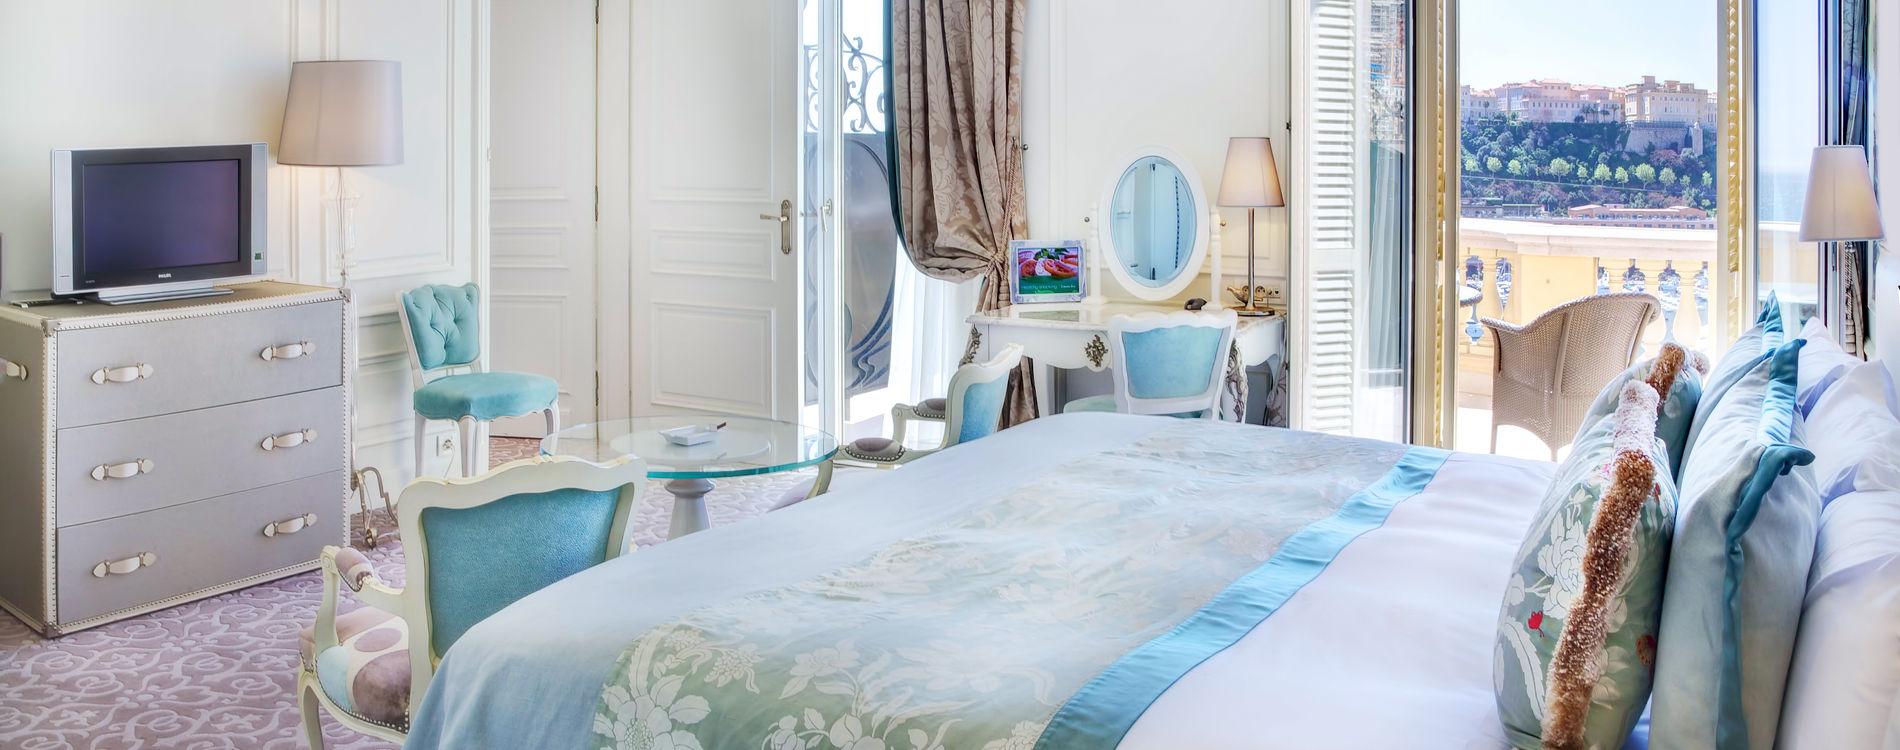 Hôtel Hermitage - Chambres